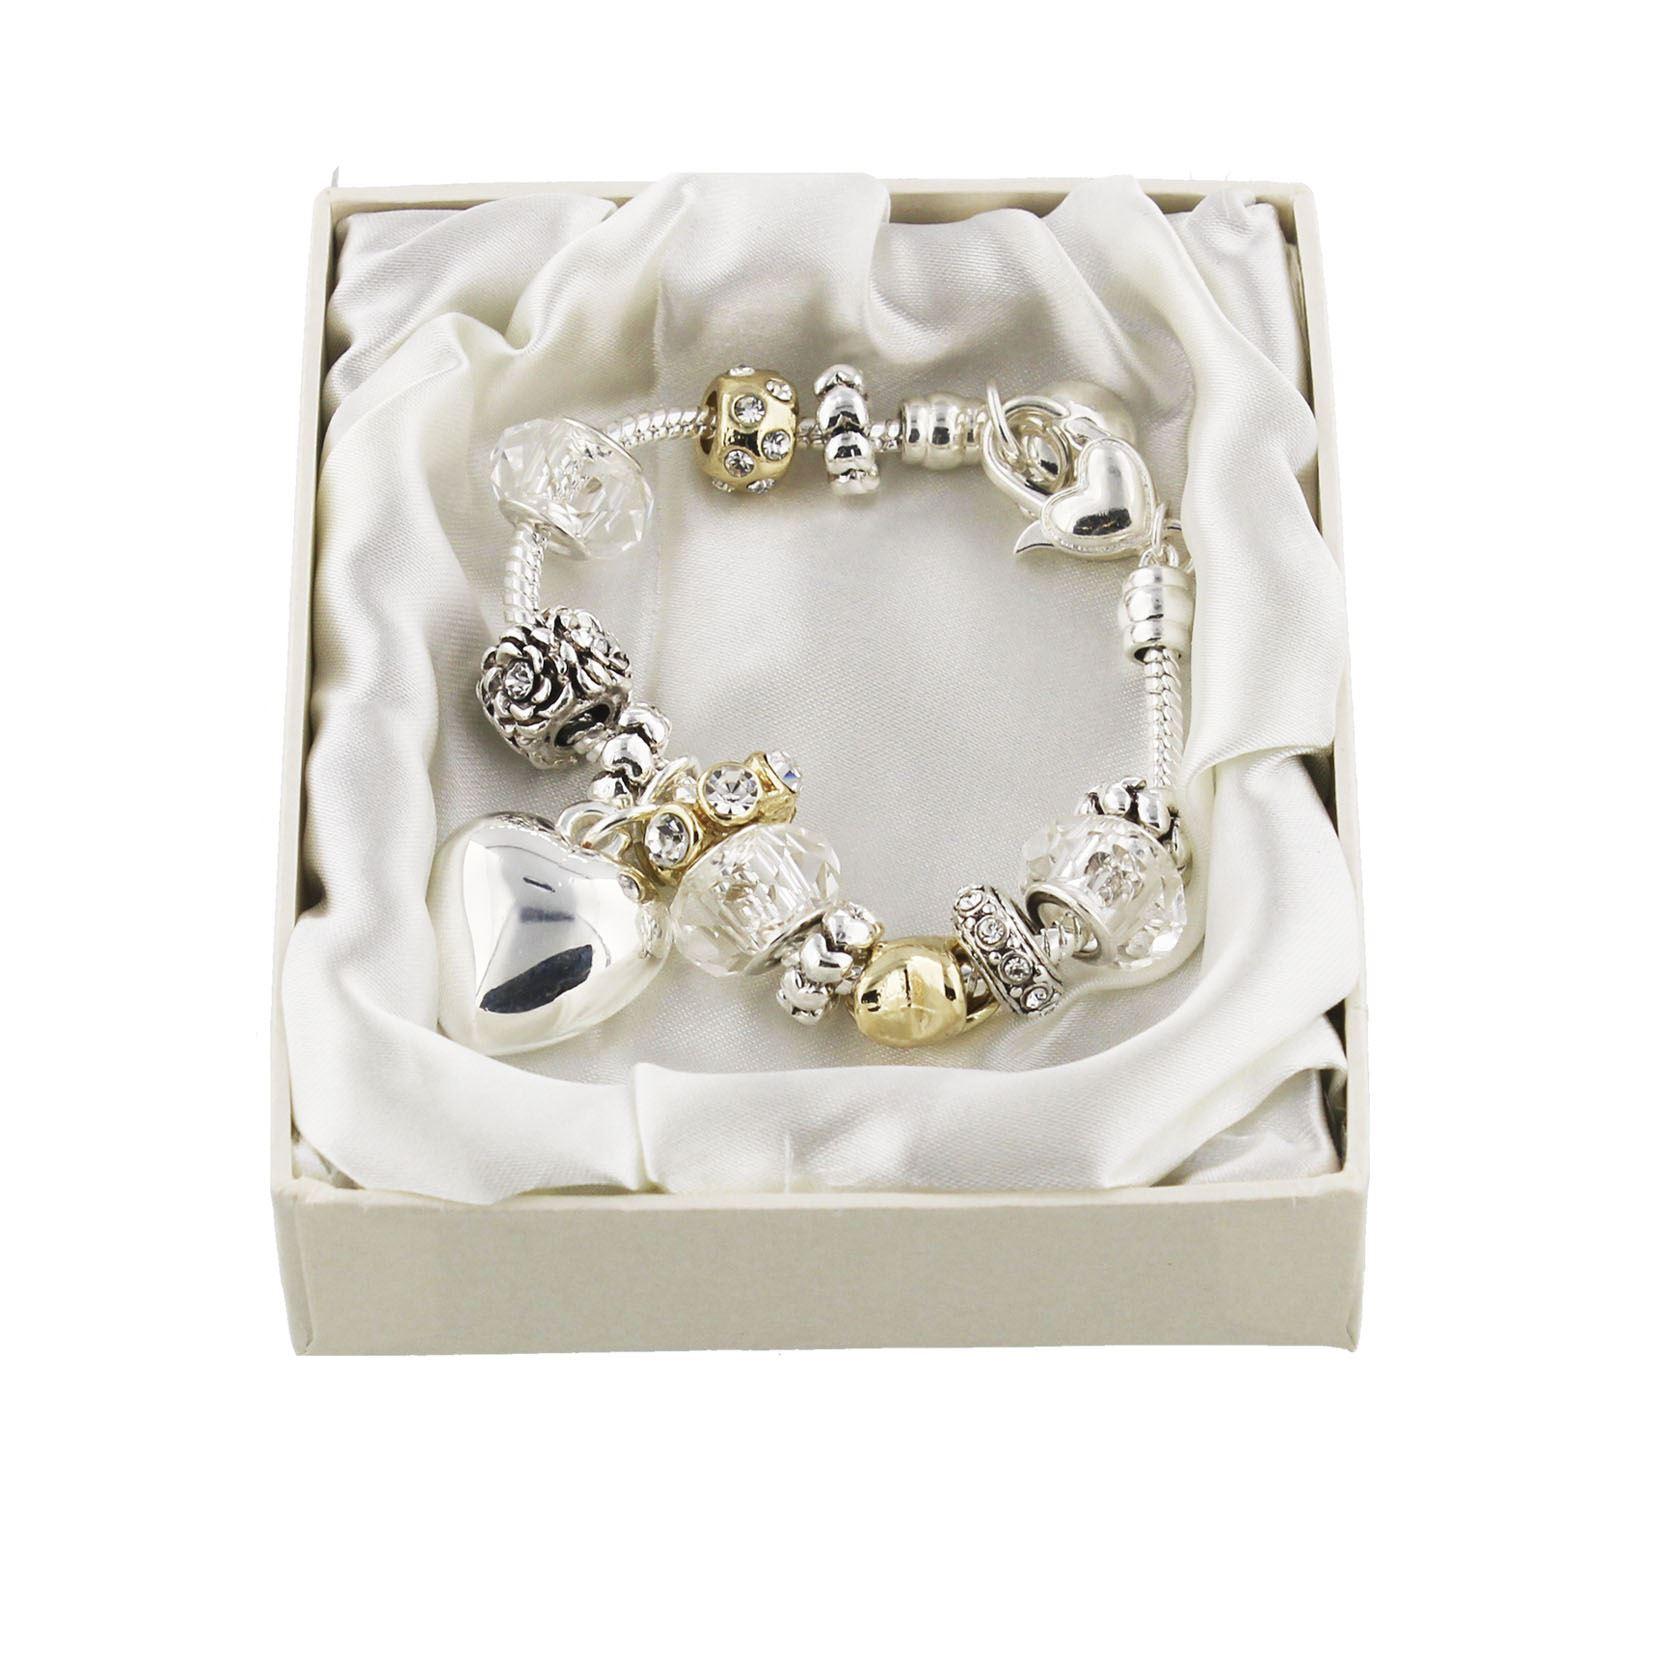 Amore Silver/Gold Bead Charm Bracelet - Bridesmaid